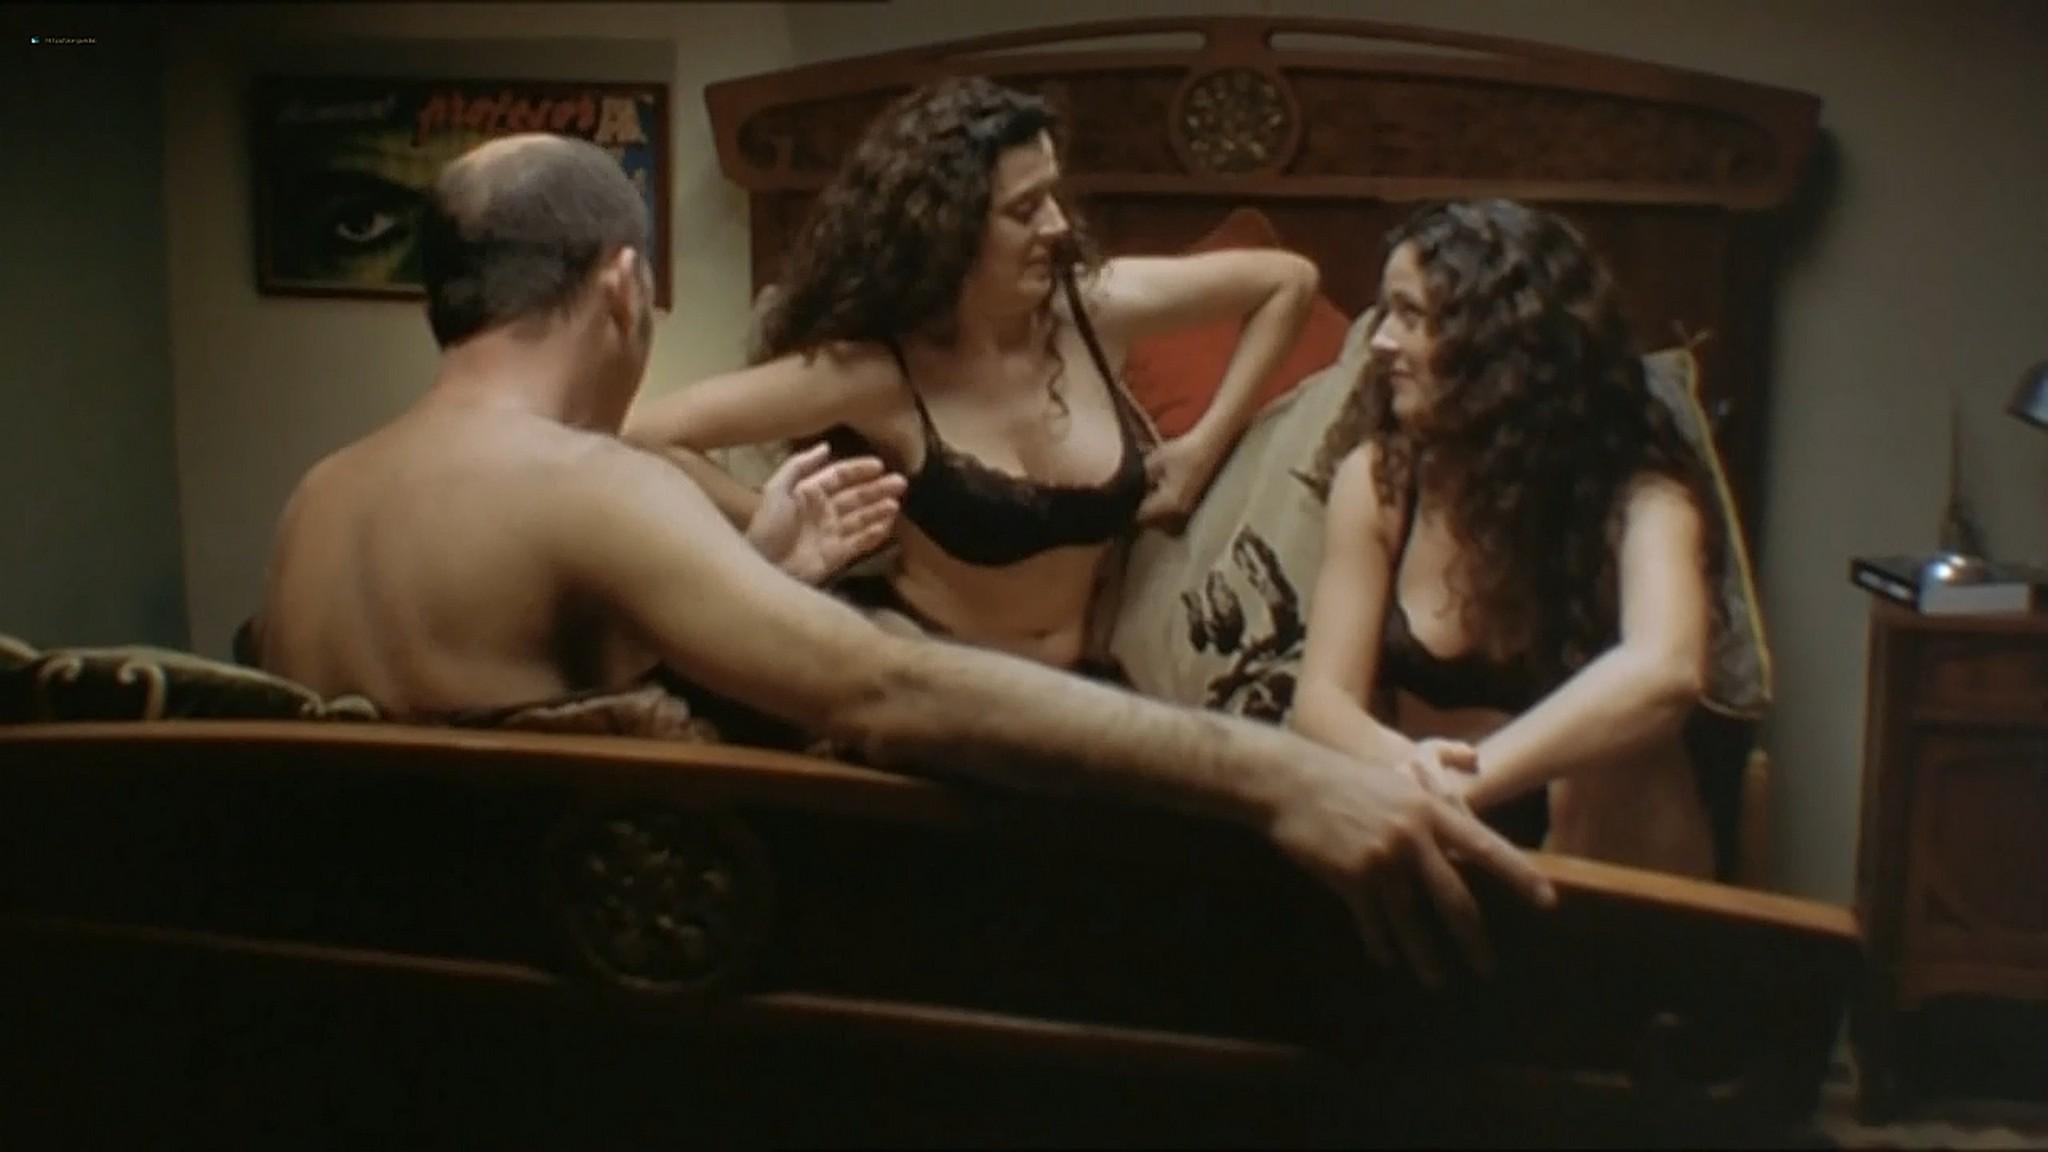 Ariadna Gil nude sex Sandra Ballesteros and other nude and sex El lado oscuro del corazon 2 AR 2001 720p 12